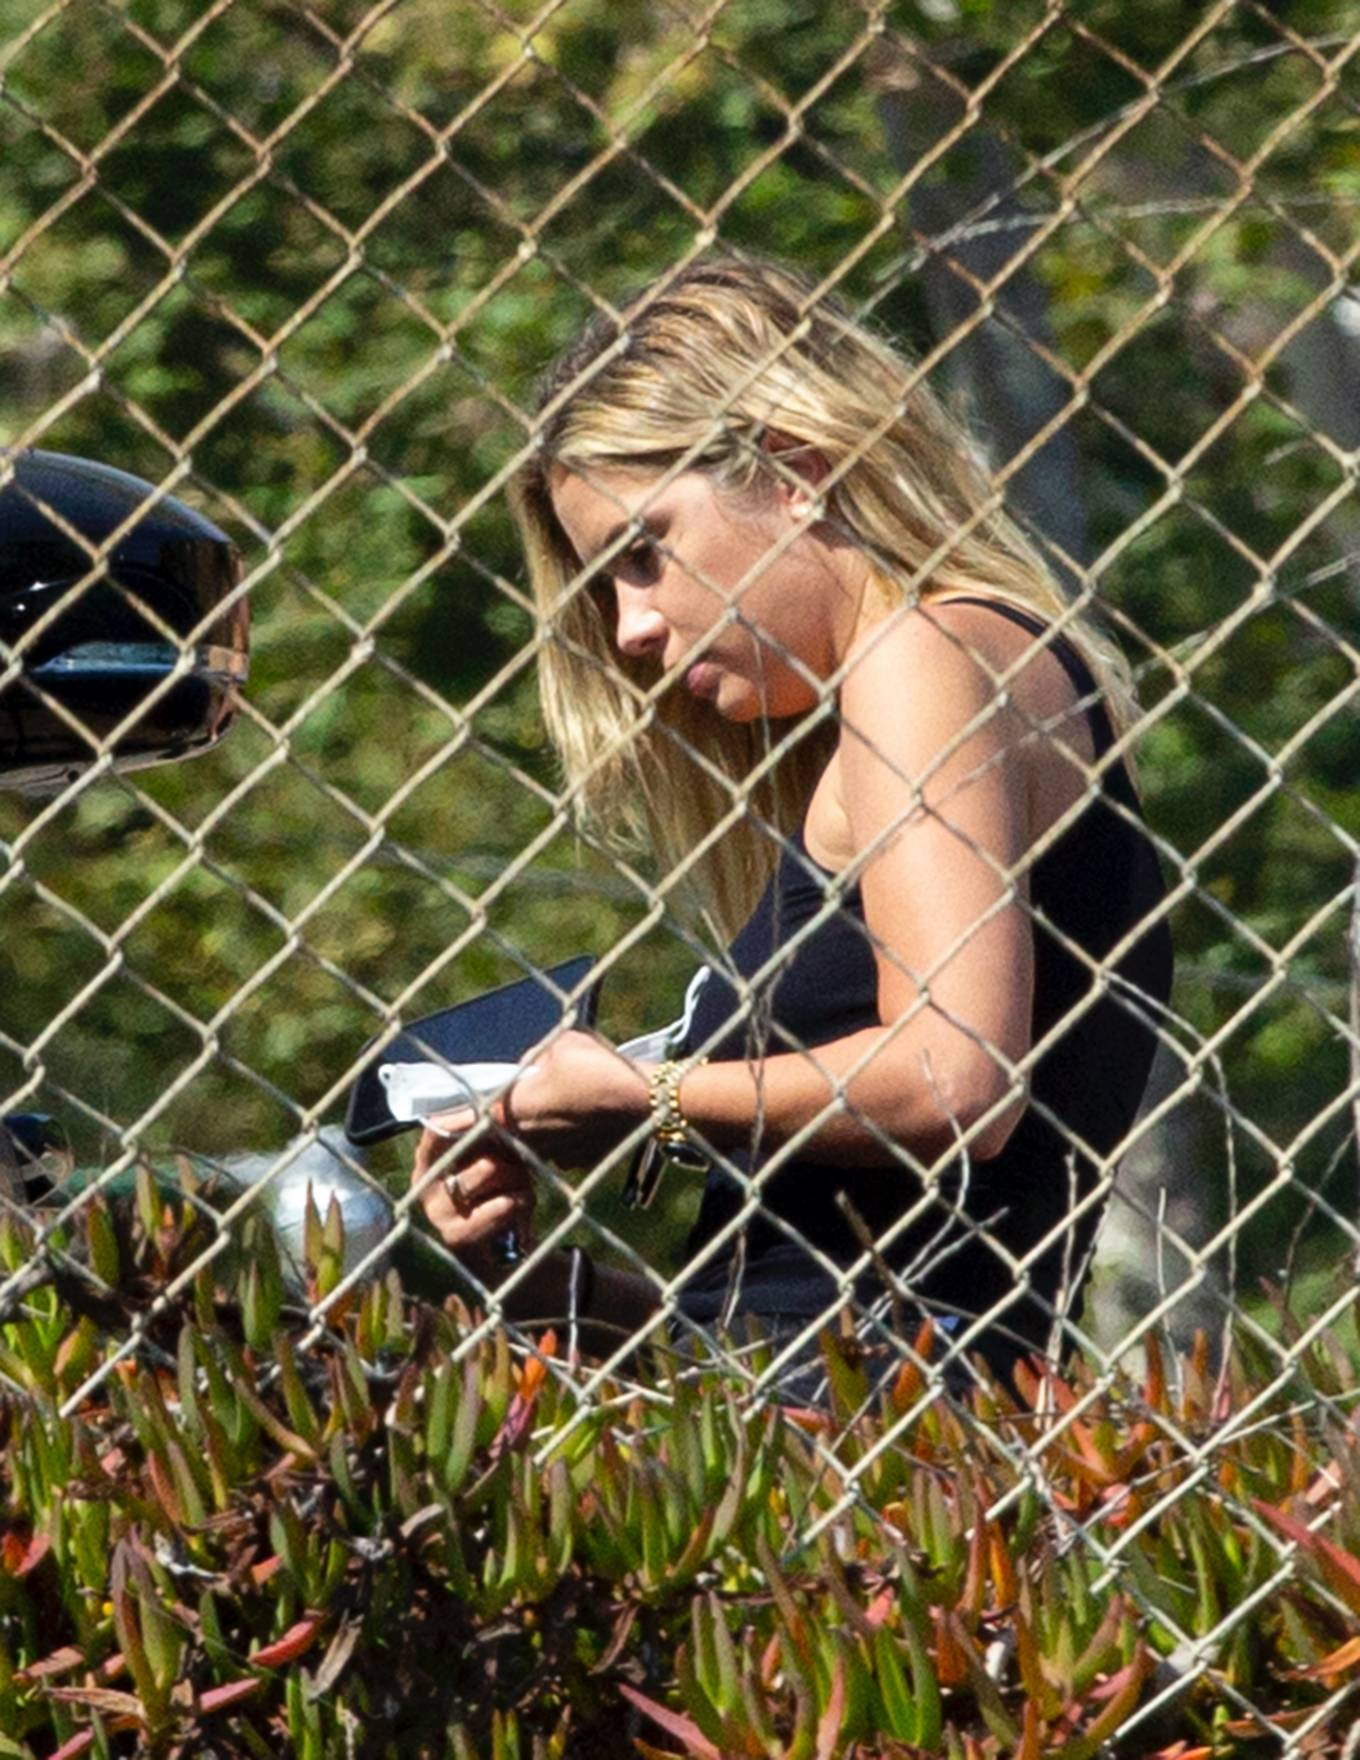 Ashley Benson 2020 : Ashley Benson and boyfriend G-Eazy as she arrives at his video shoot in Malibu-02